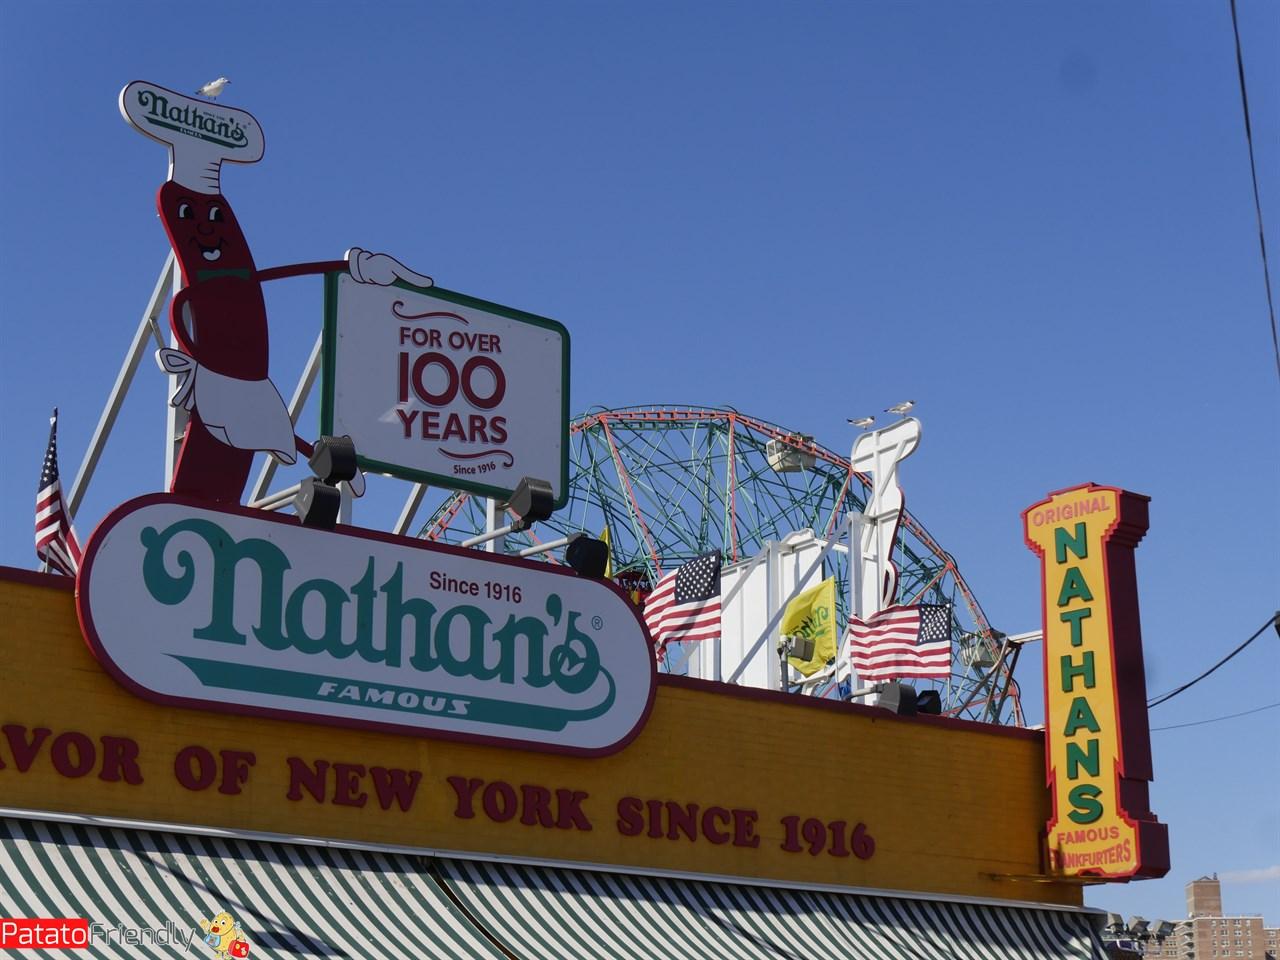 [cml_media_alt id='13788']Dove mangiare a Coney island gli hote dog di Nathan's[/cml_media_alt]